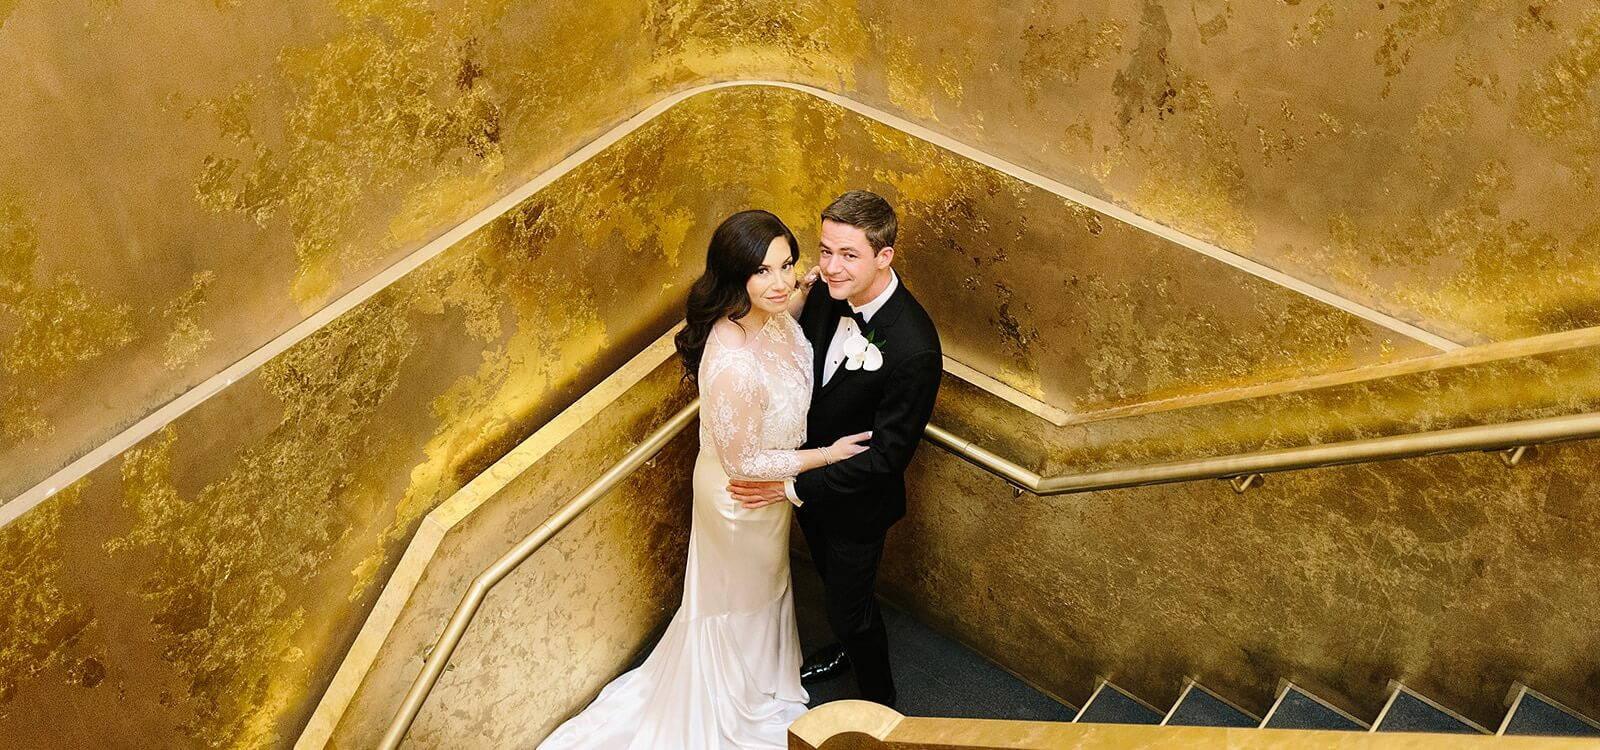 Hero image for Erin and Tony's Stylish Wedding at Ricarda's